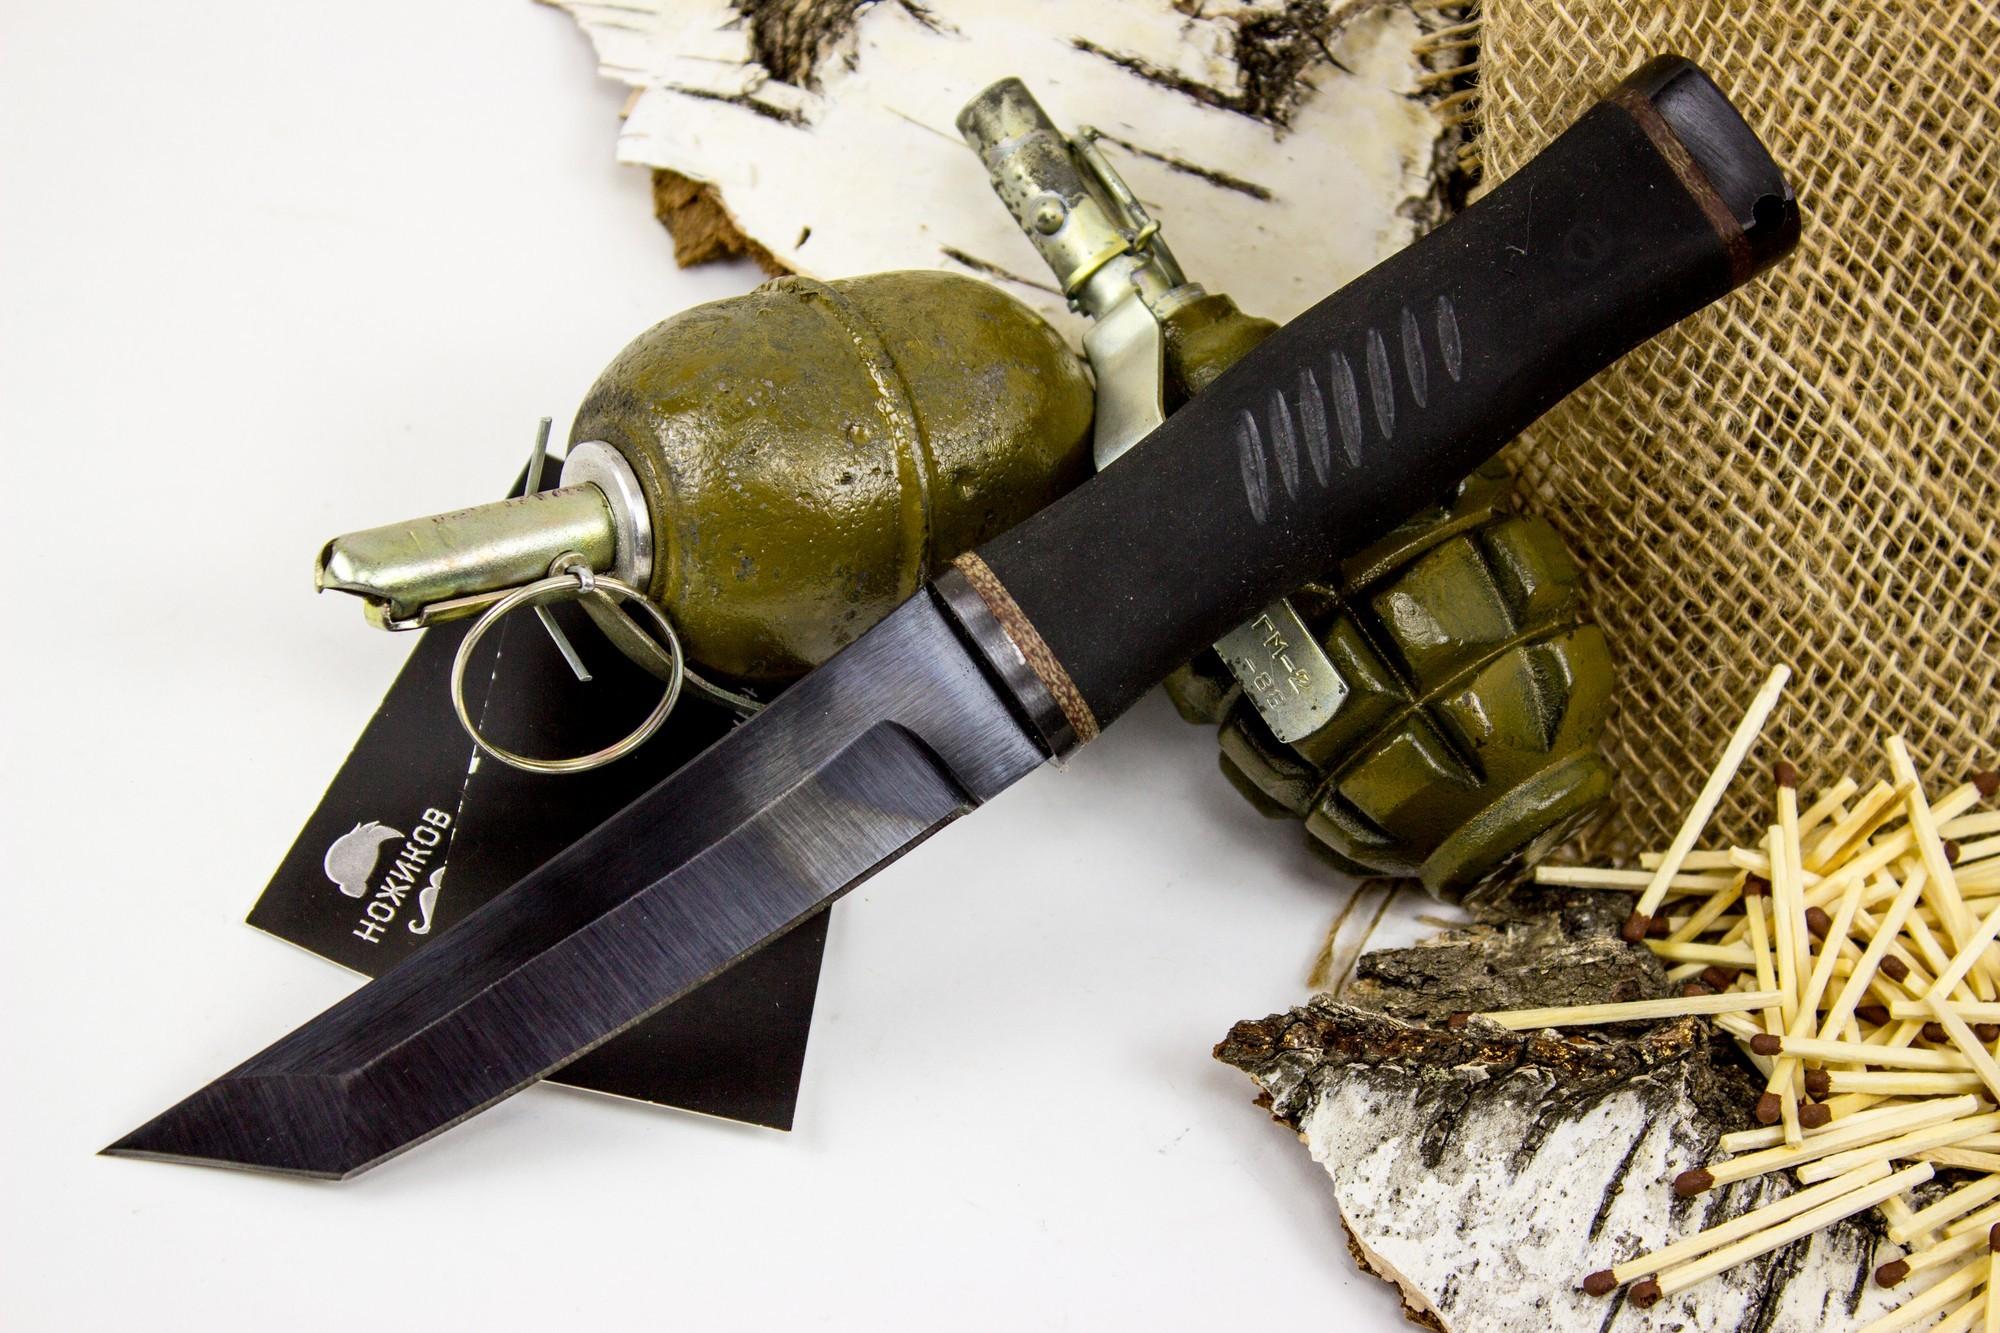 Фото 5 - Нож Кабан-1М, сталь 65Г, резина от Титов и Солдатова